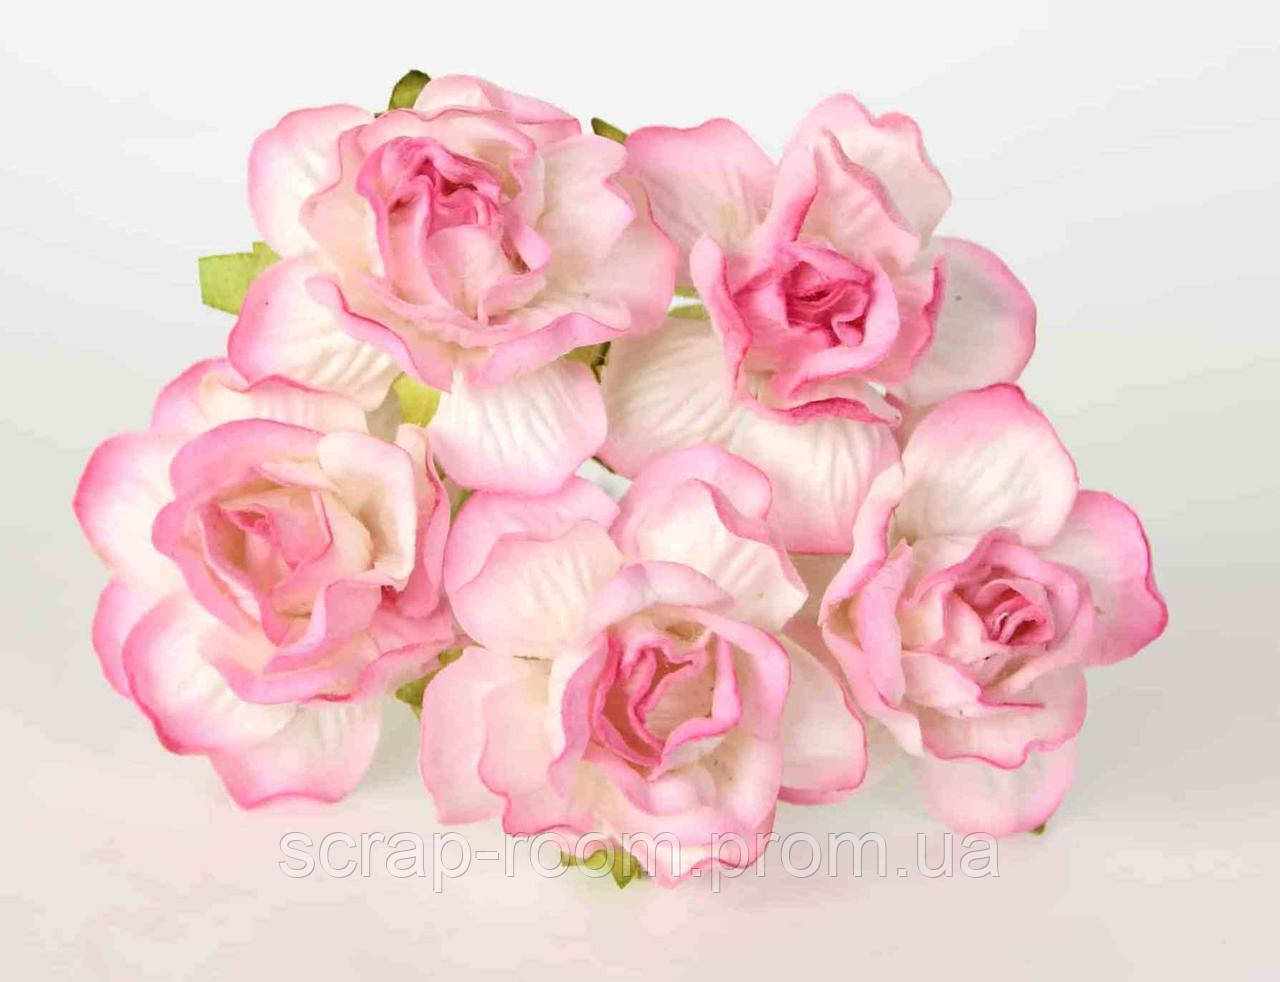 Роза бумажная бело-розовая диаметр 4,5 см, роза розово-белая, роза розовая Таиланд 2,5 см, цена за 1 шт